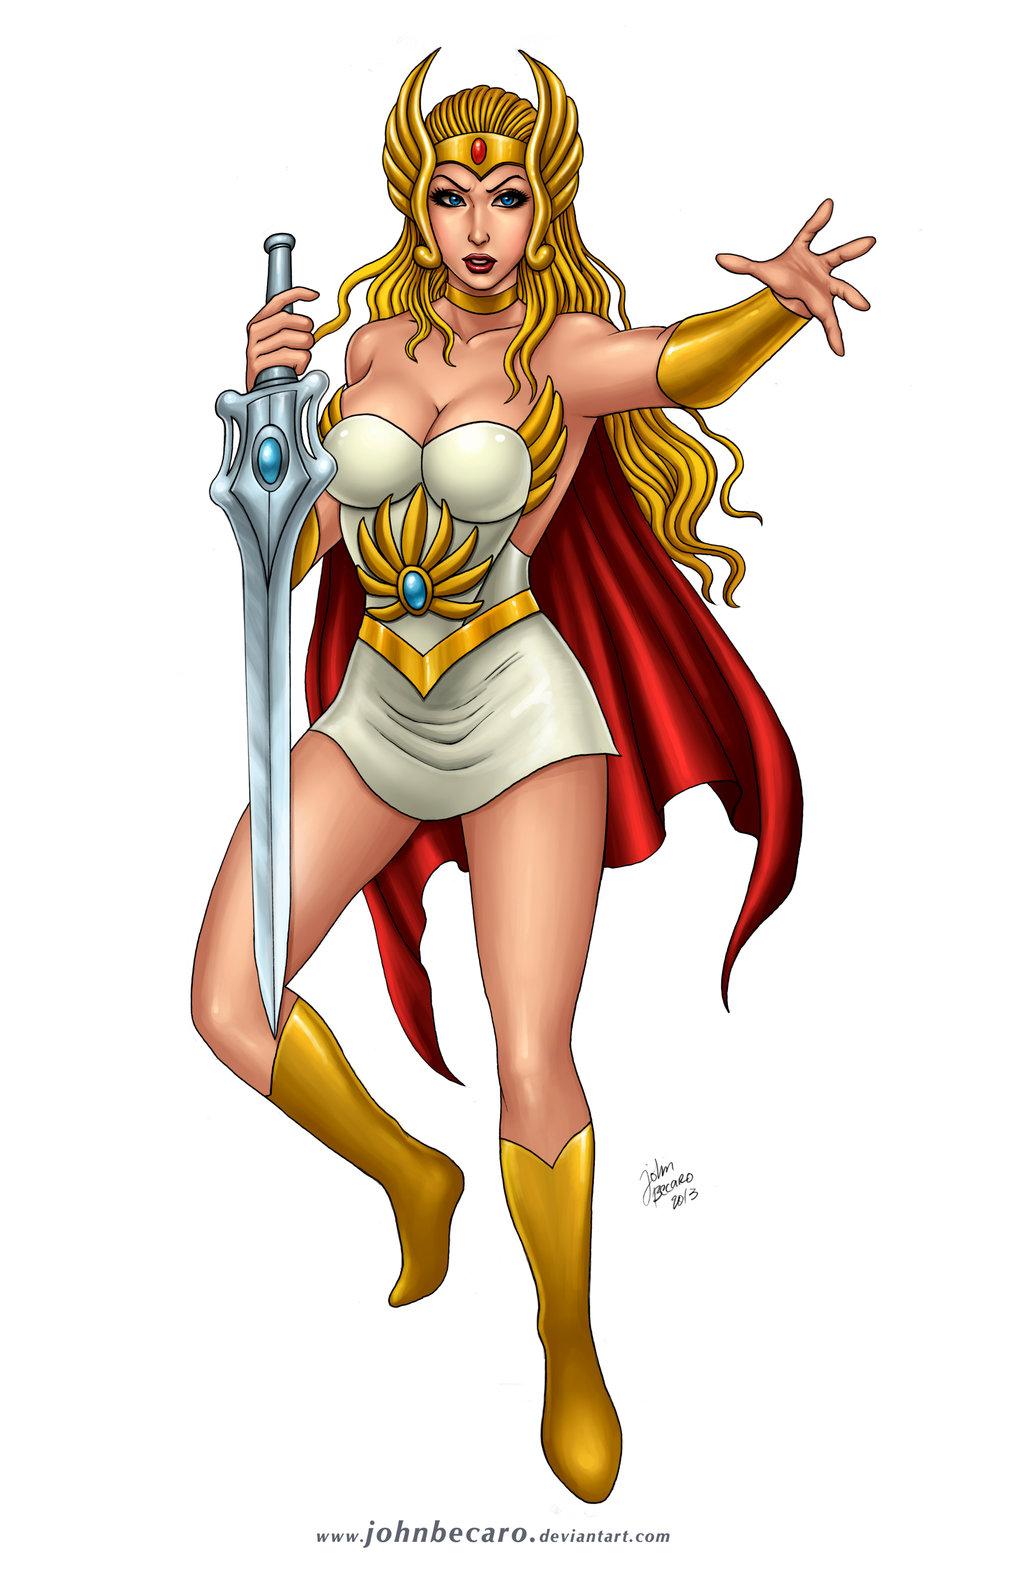 1024x1583 > She-Ra: Princess Of Power Wallpapers